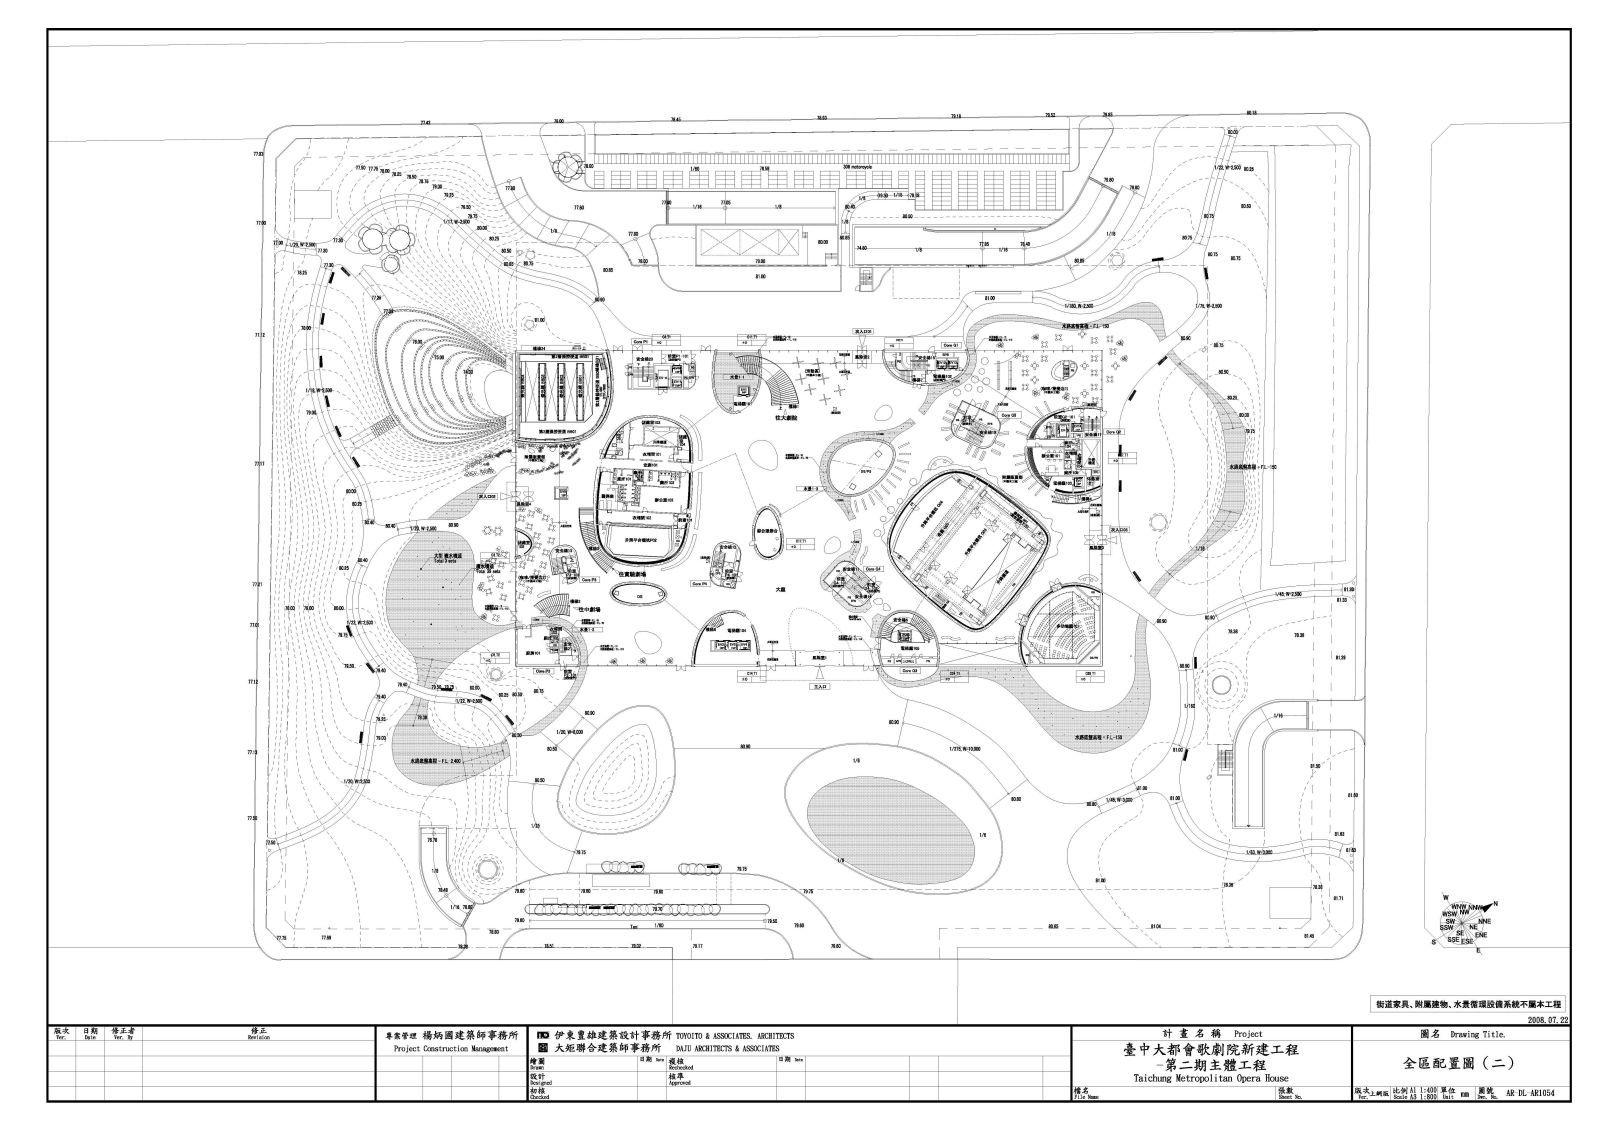 Sendai Mediatheque Floor Plans Taichung Metropolitan Opera House Architectural Drawings